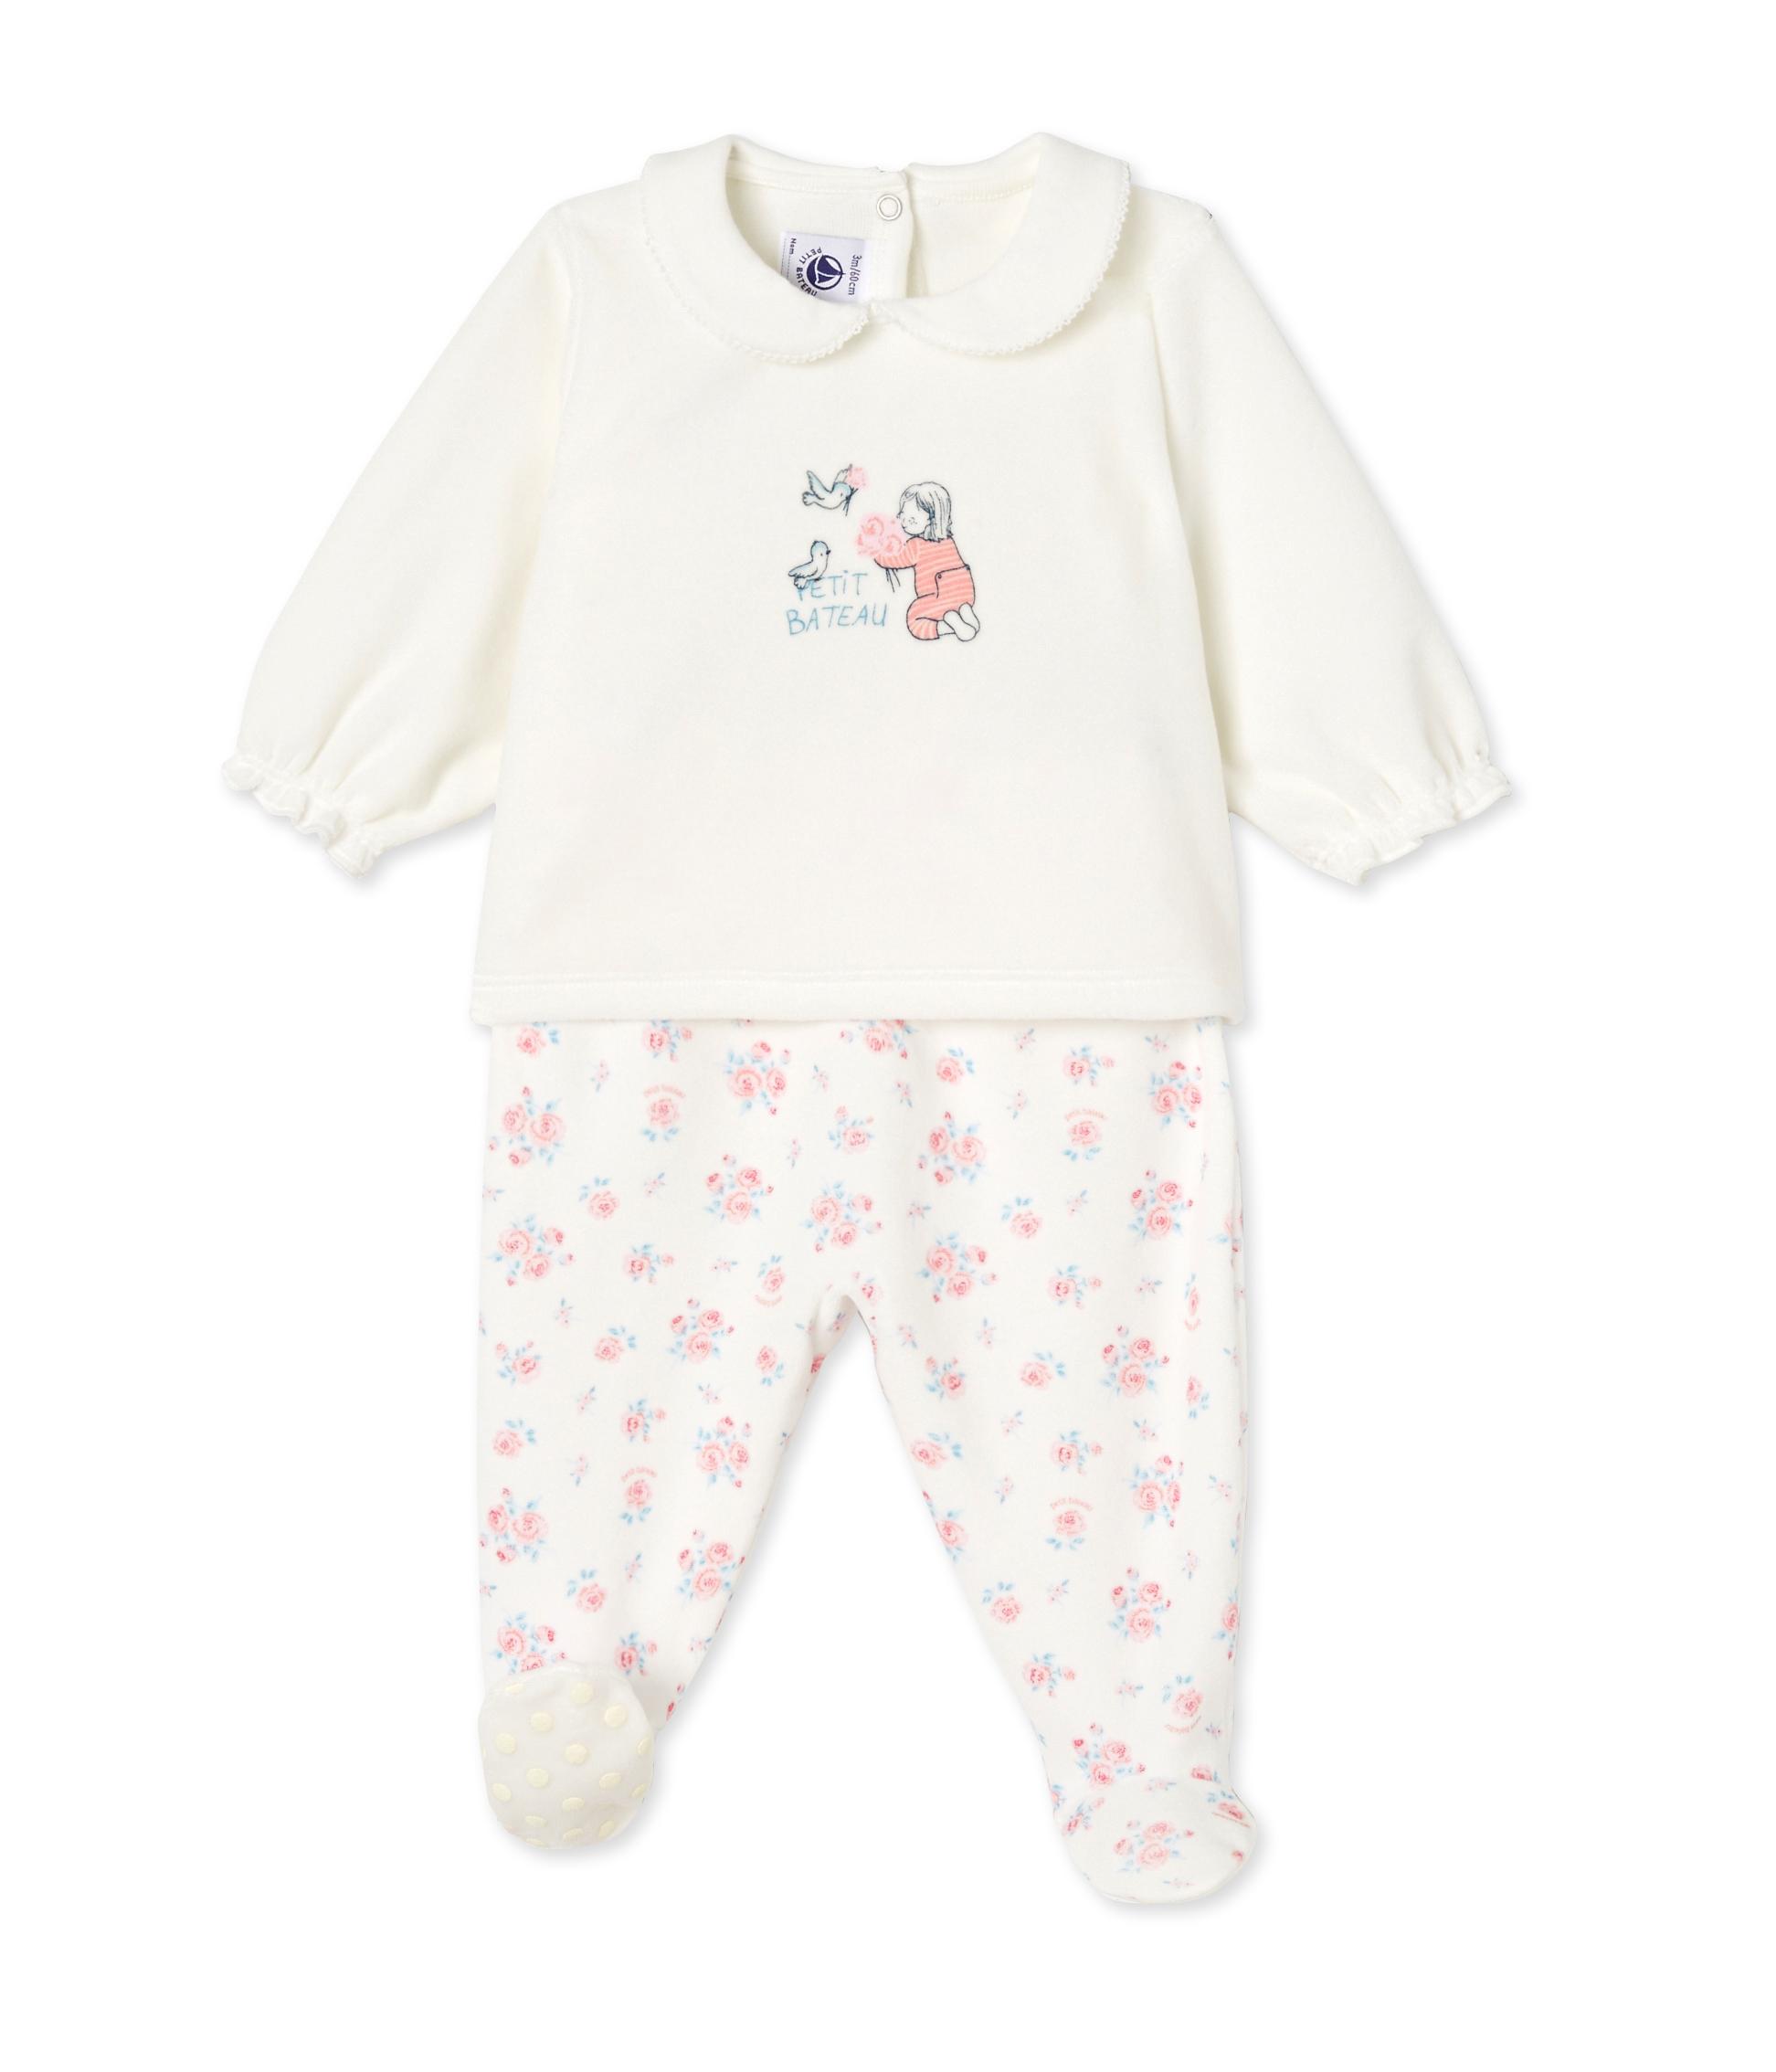 e7759367735ad Pyjama bébé fille à pieds